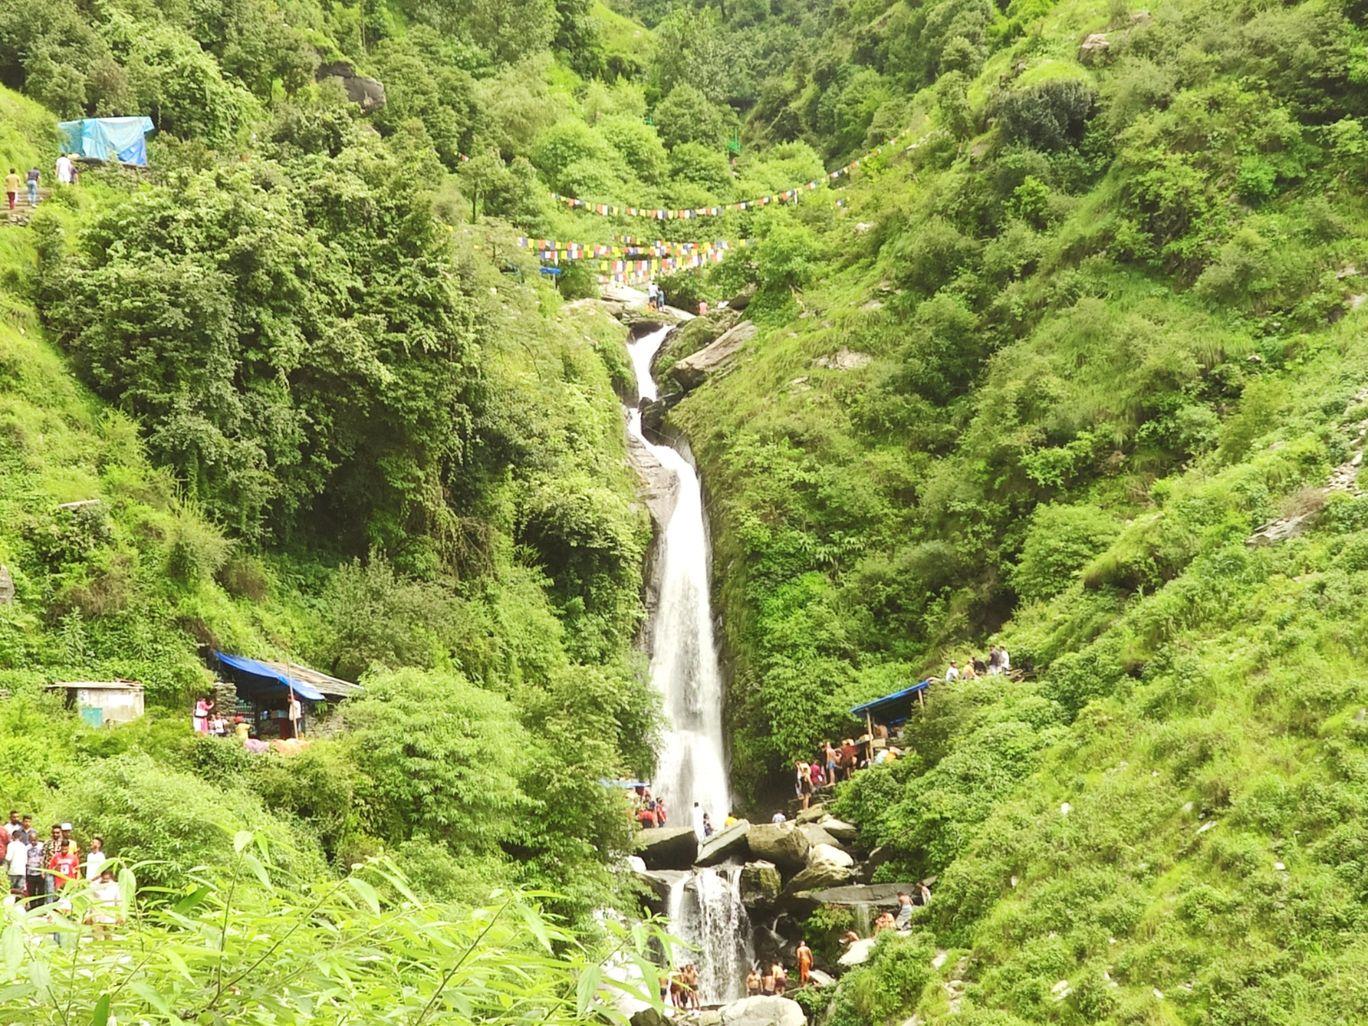 Photo of Bhagsu Nag Water Fall By Priya's Travel Story